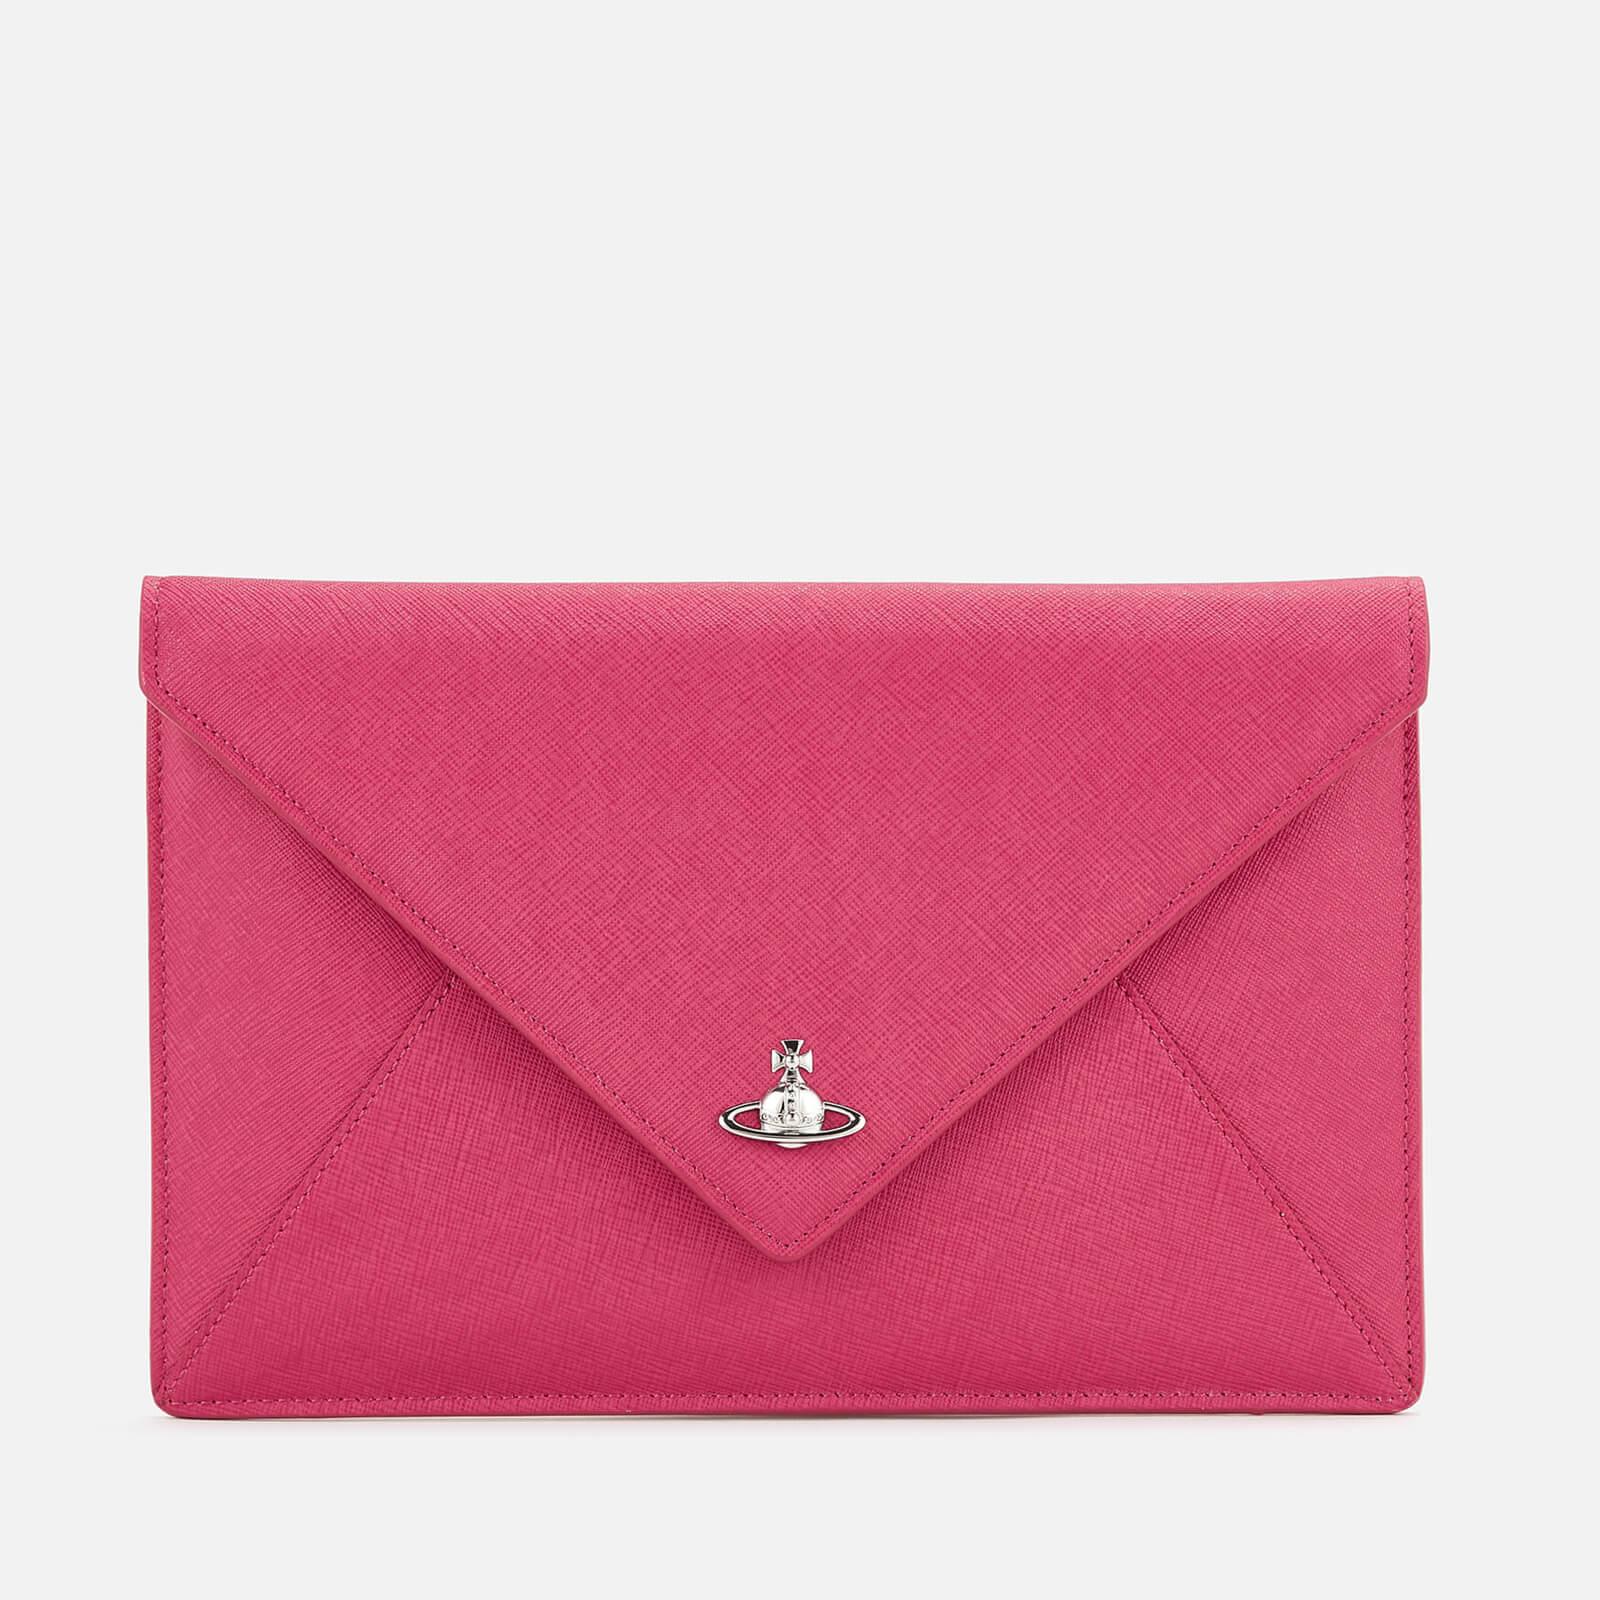 265c386afa1f Vivienne Westwood Women s Victoria Envelope Clutch Bag - Pink - Free ...